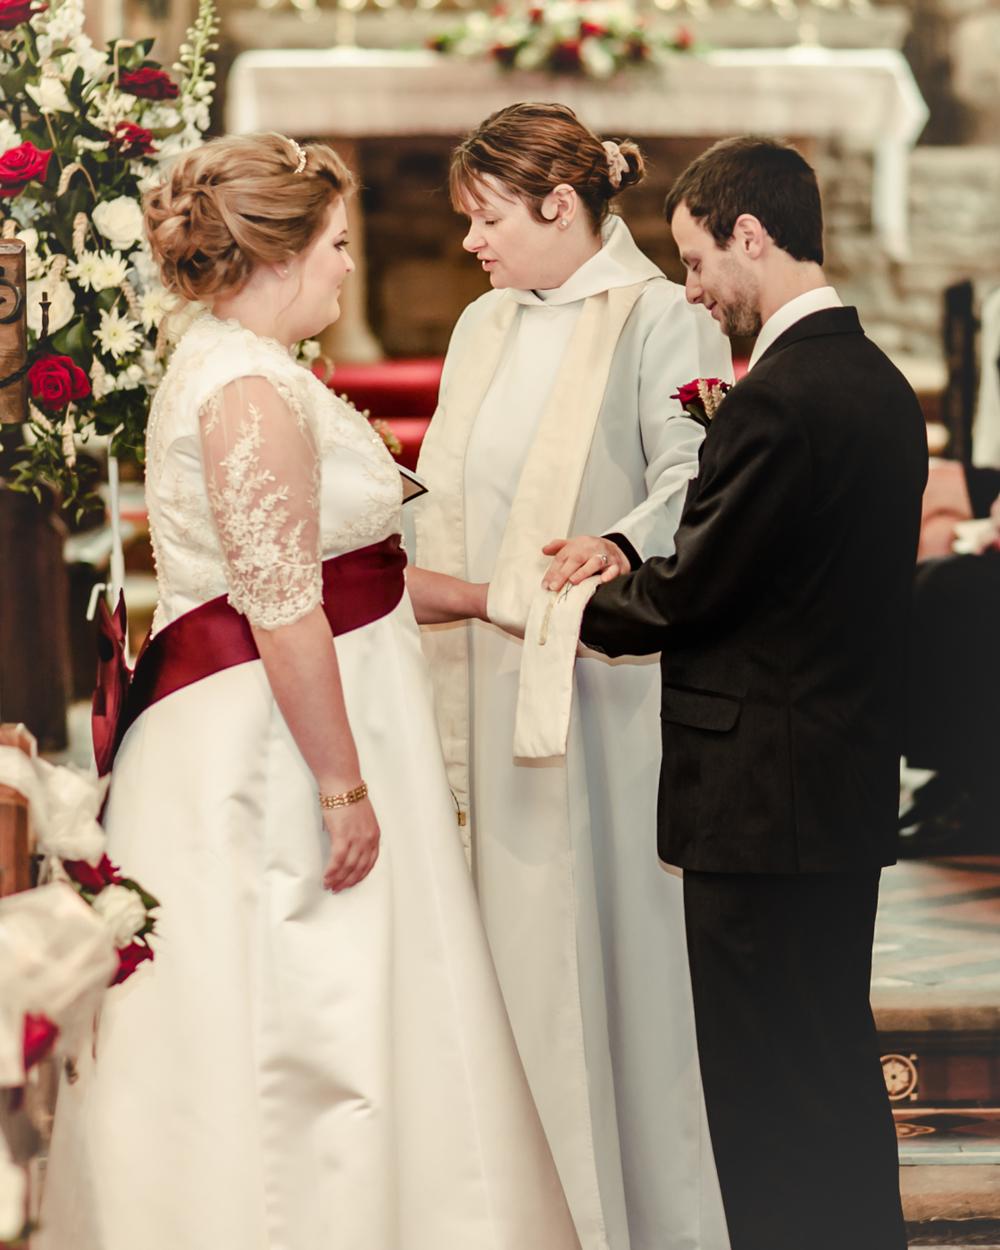 082- Harriet and Jack Kelham House Country Manor Hotel Wedding in Newark UK Photography by Pamela and Mark Pugh WWW.MPMEDIA.CO.UK -2.JPG